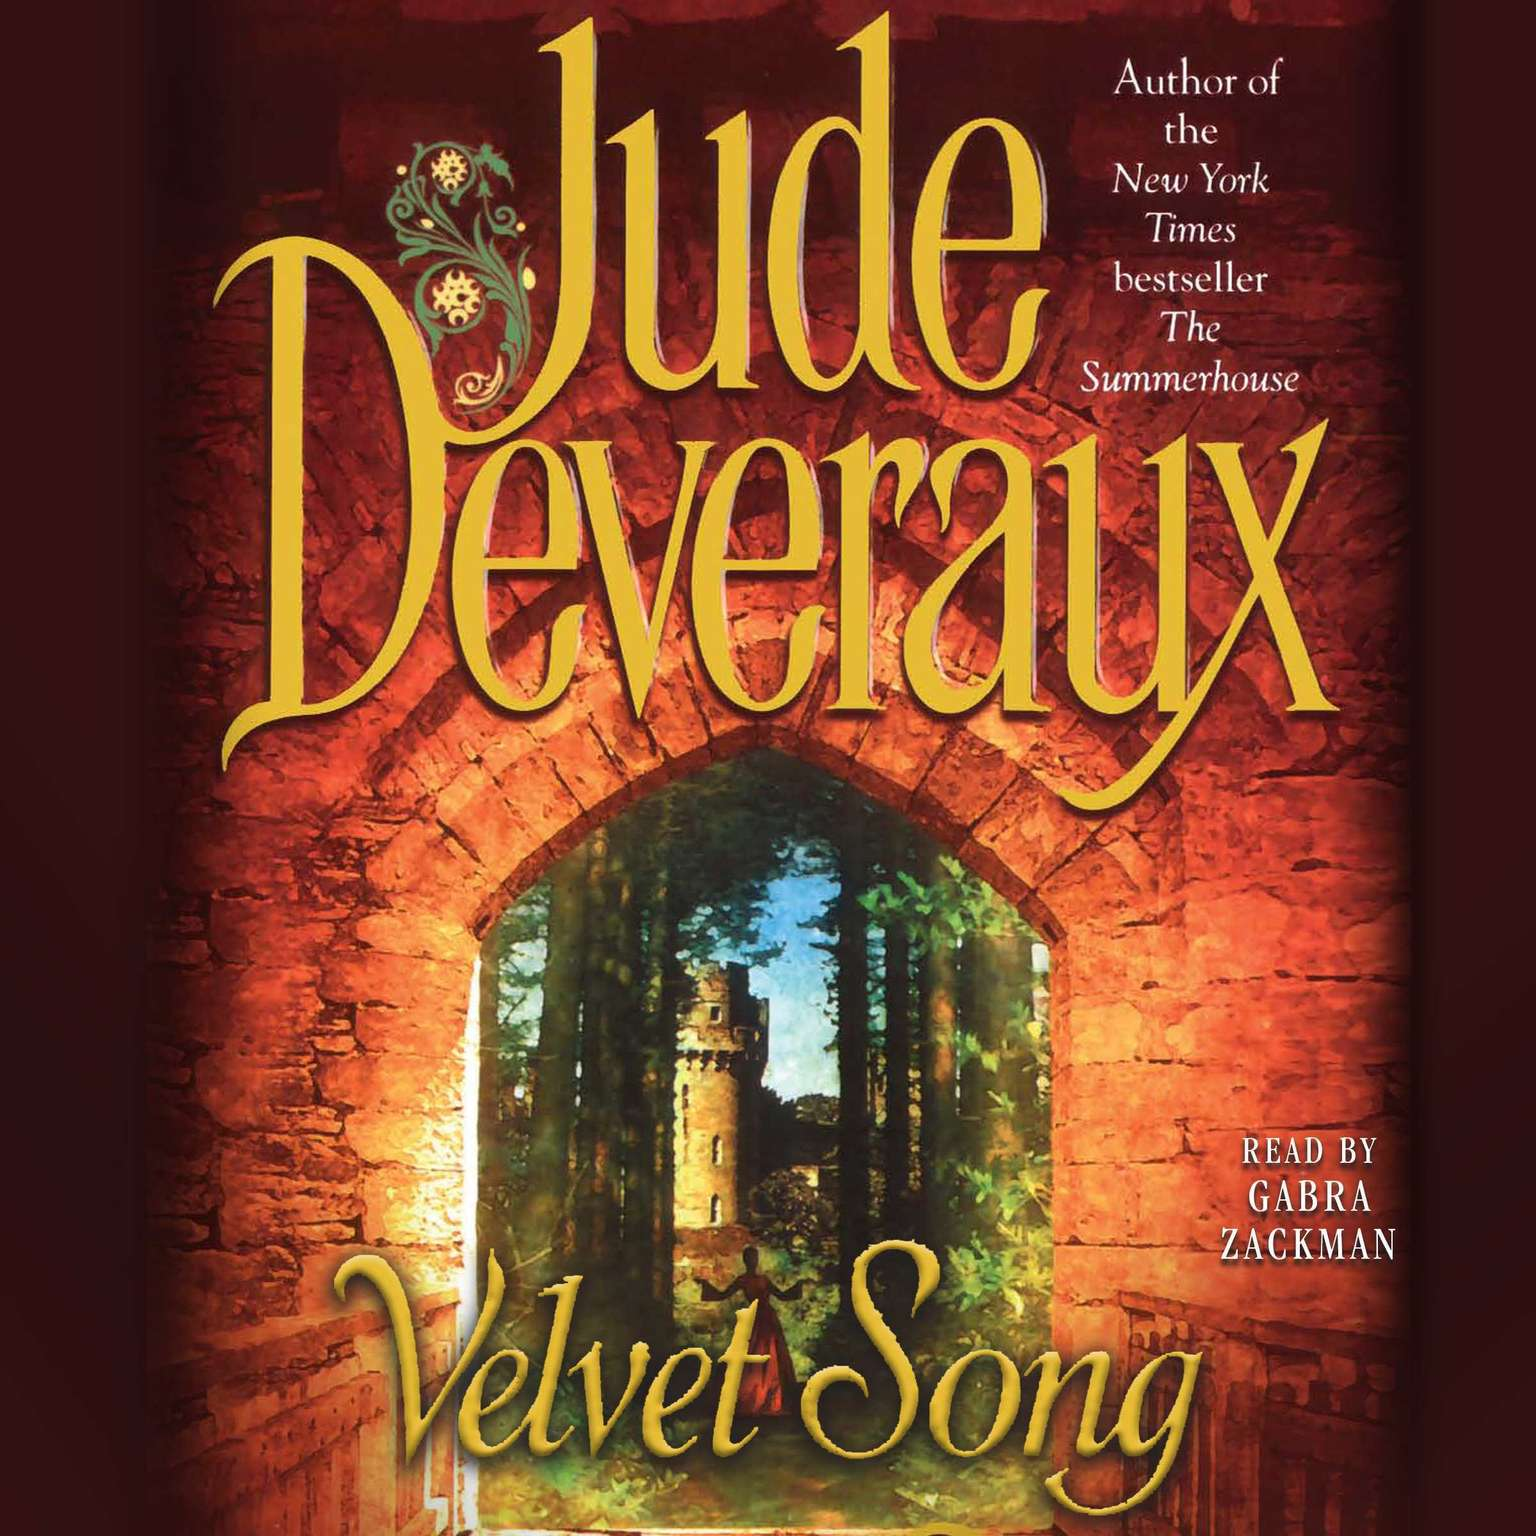 Velvet Song Audiobook, by Jude Deveraux